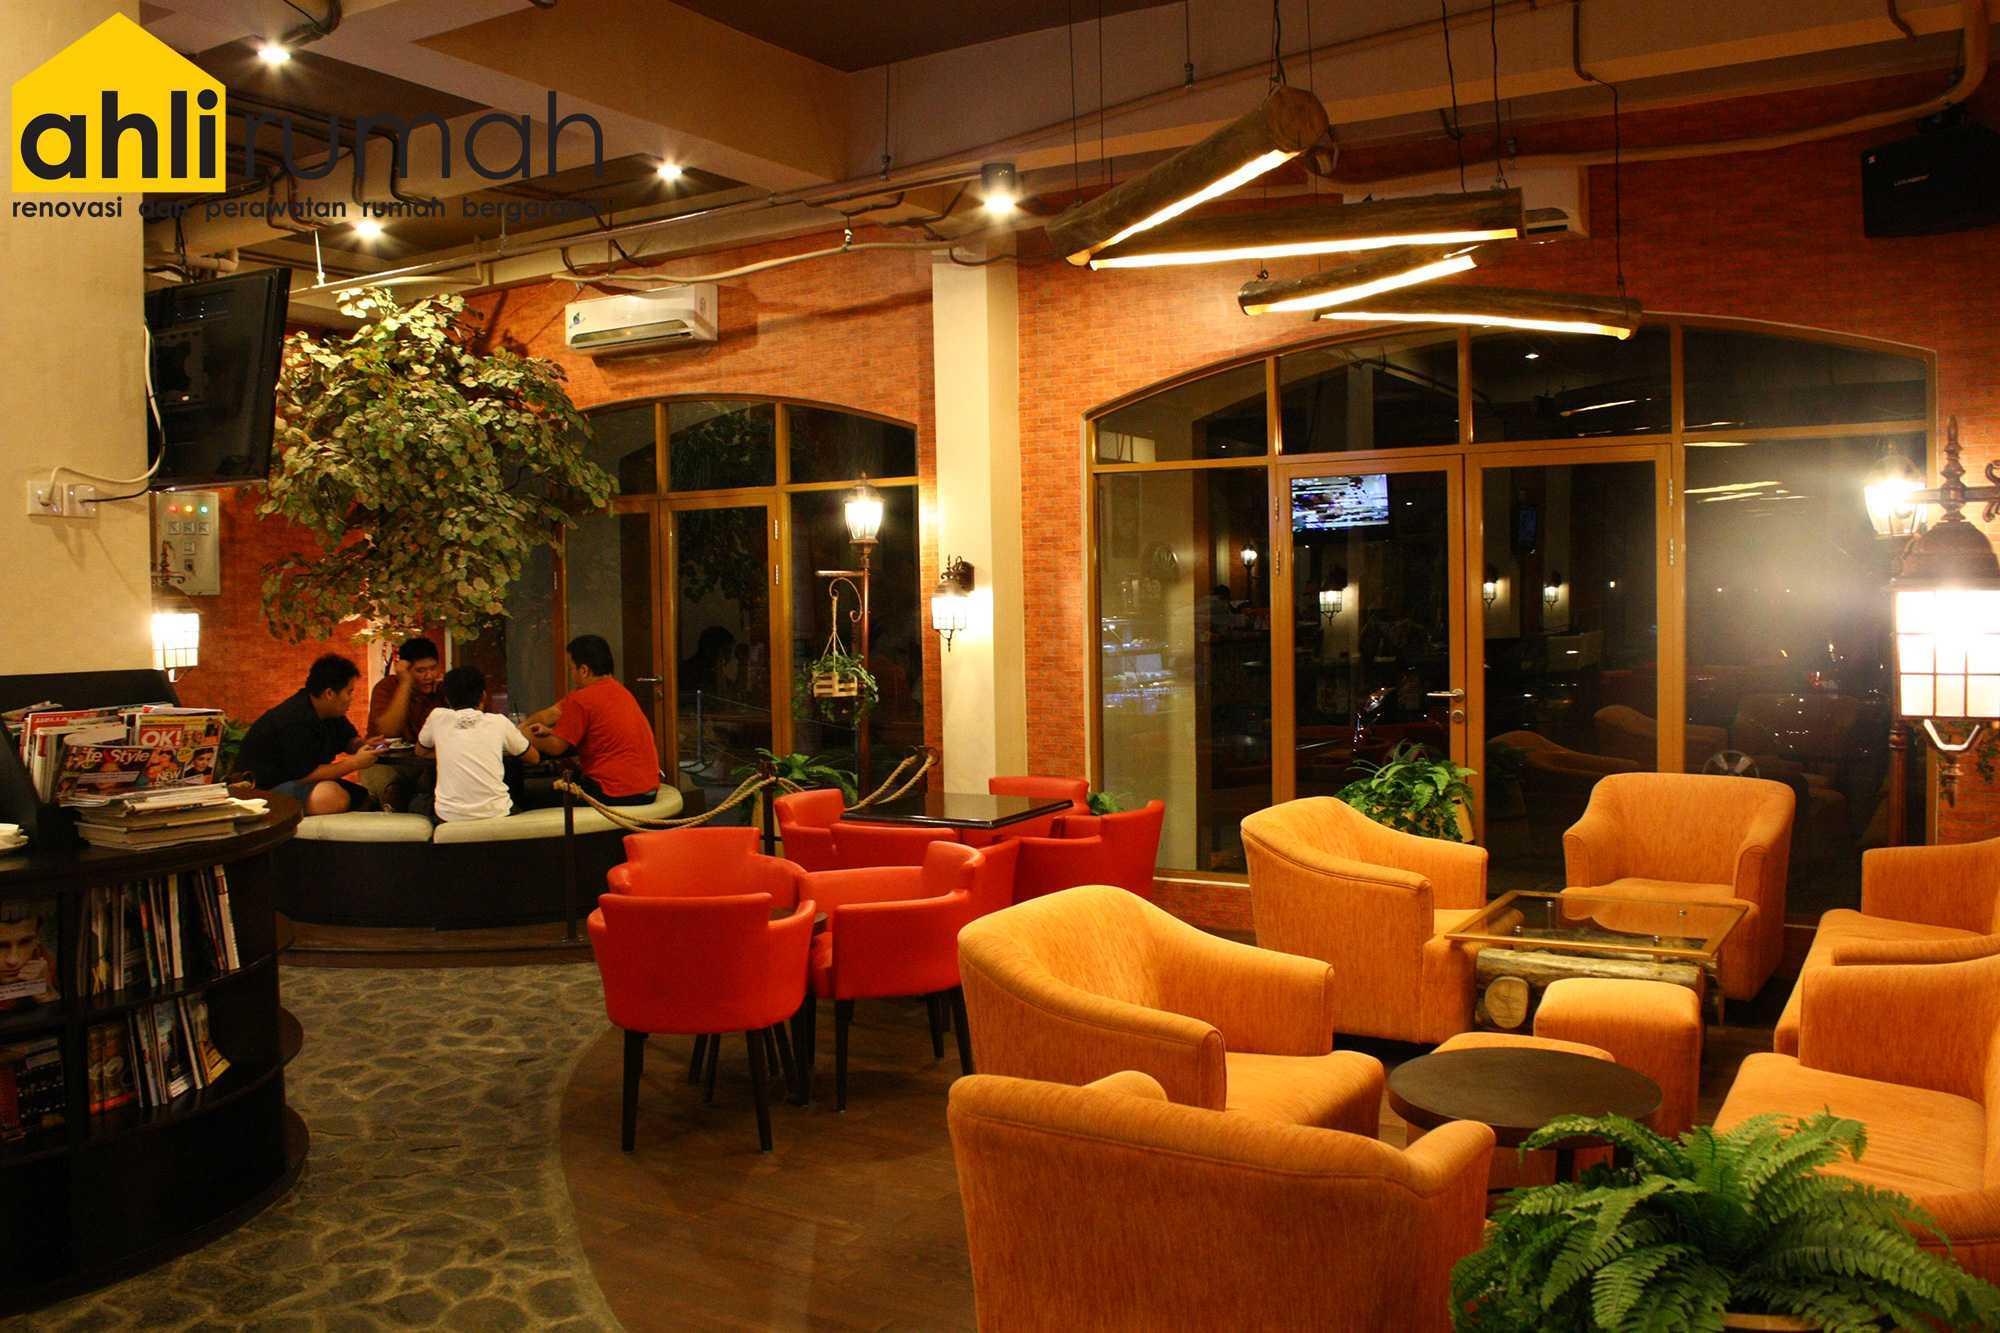 Ahlirumah.id Interior - G8 Shop Jakarta, Daerah Khusus Ibukota Jakarta, Indonesia  Seating Area Restaurant   49175